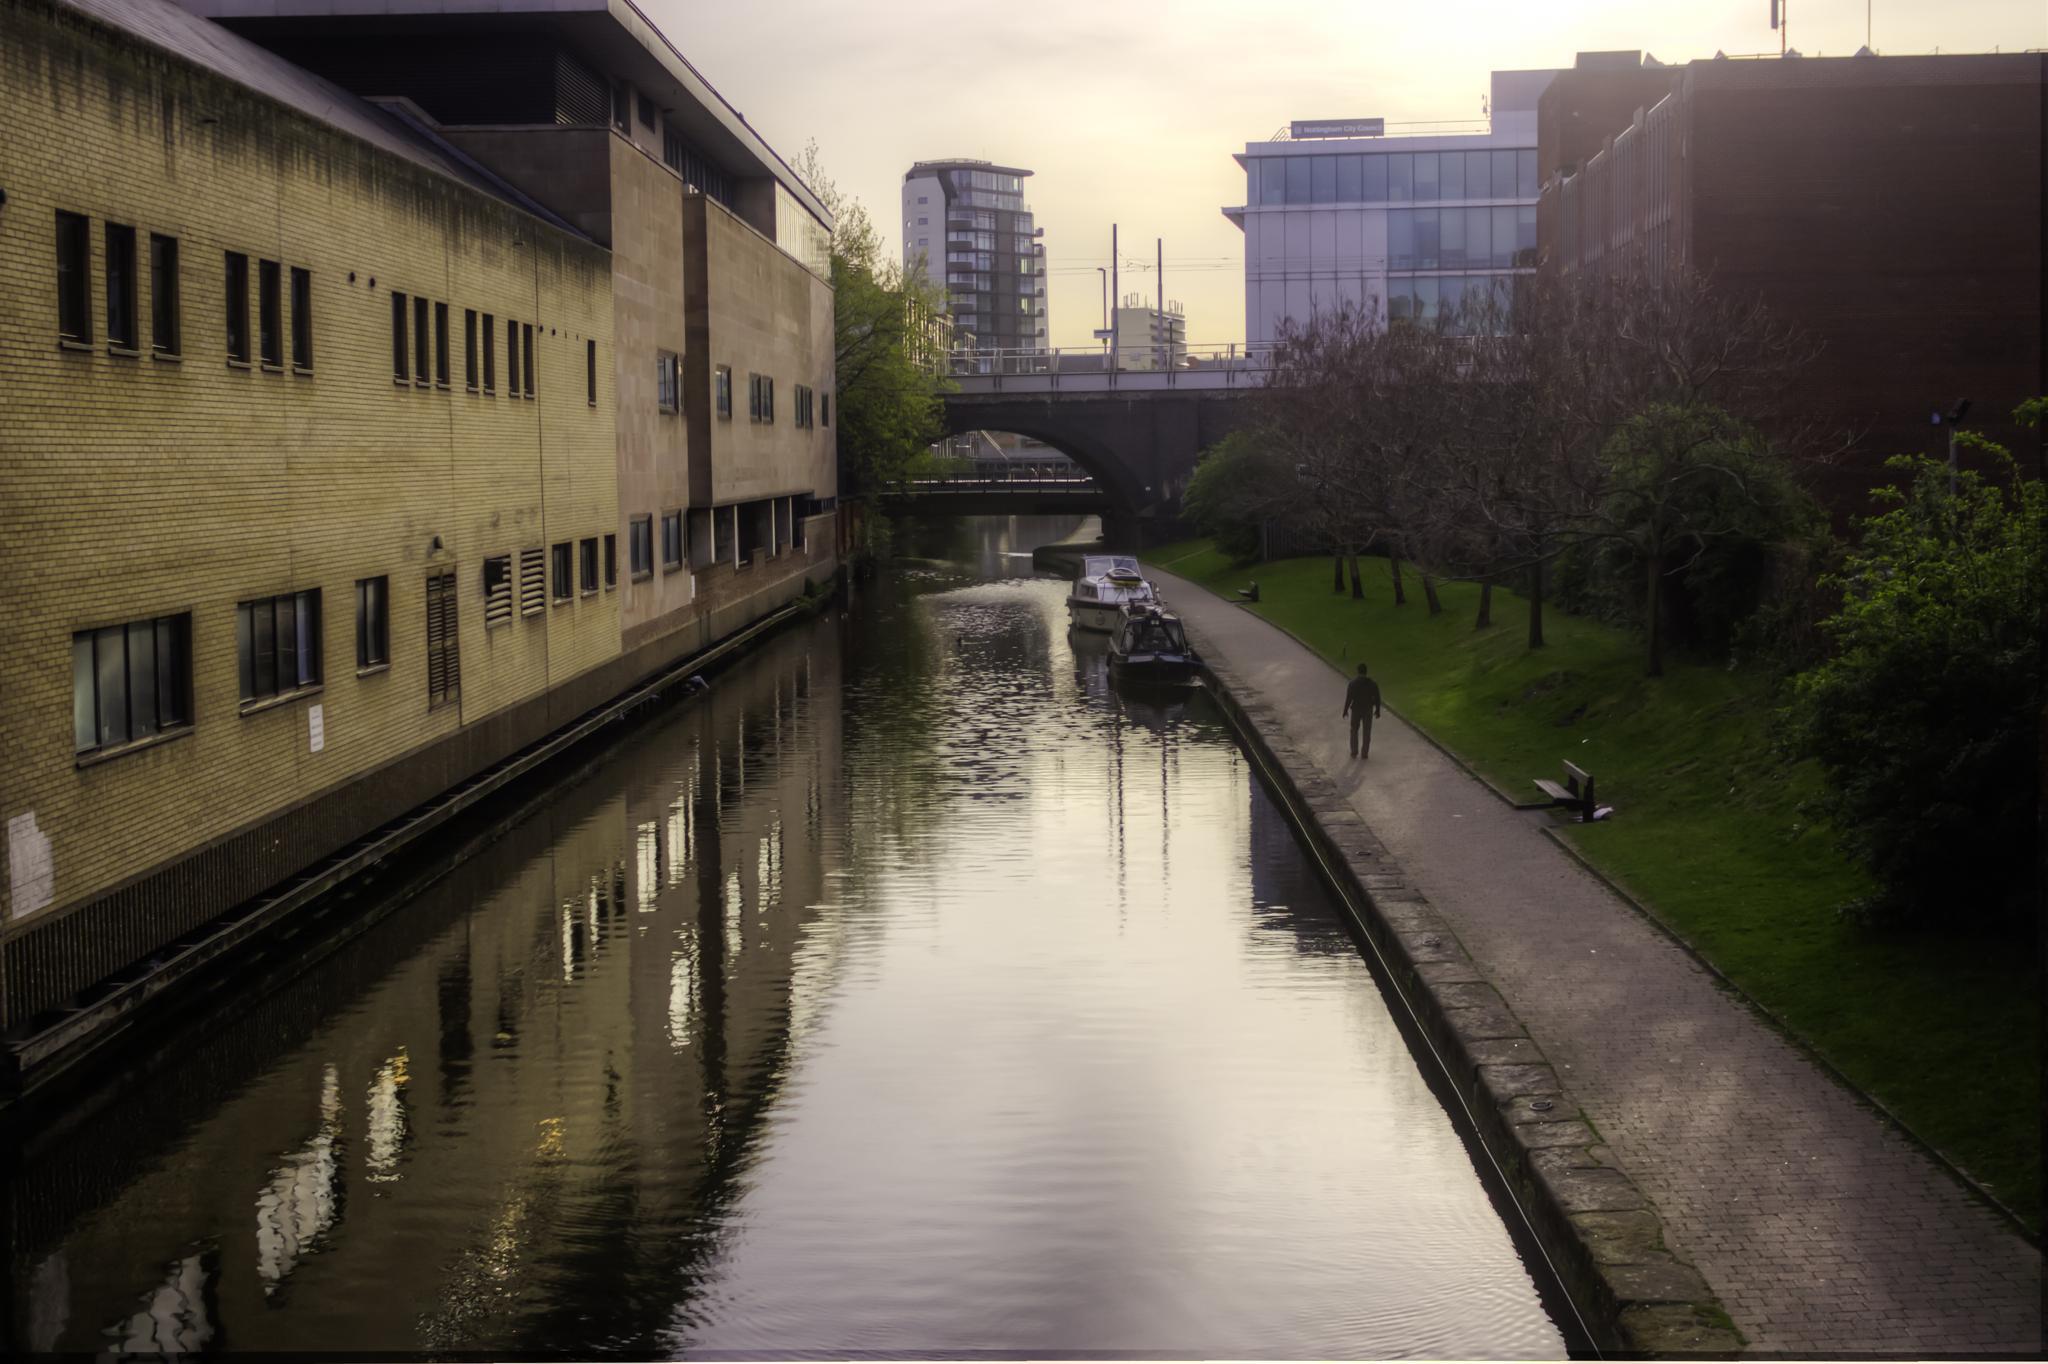 Sunrise at Nottingham Canal by tibcsi528